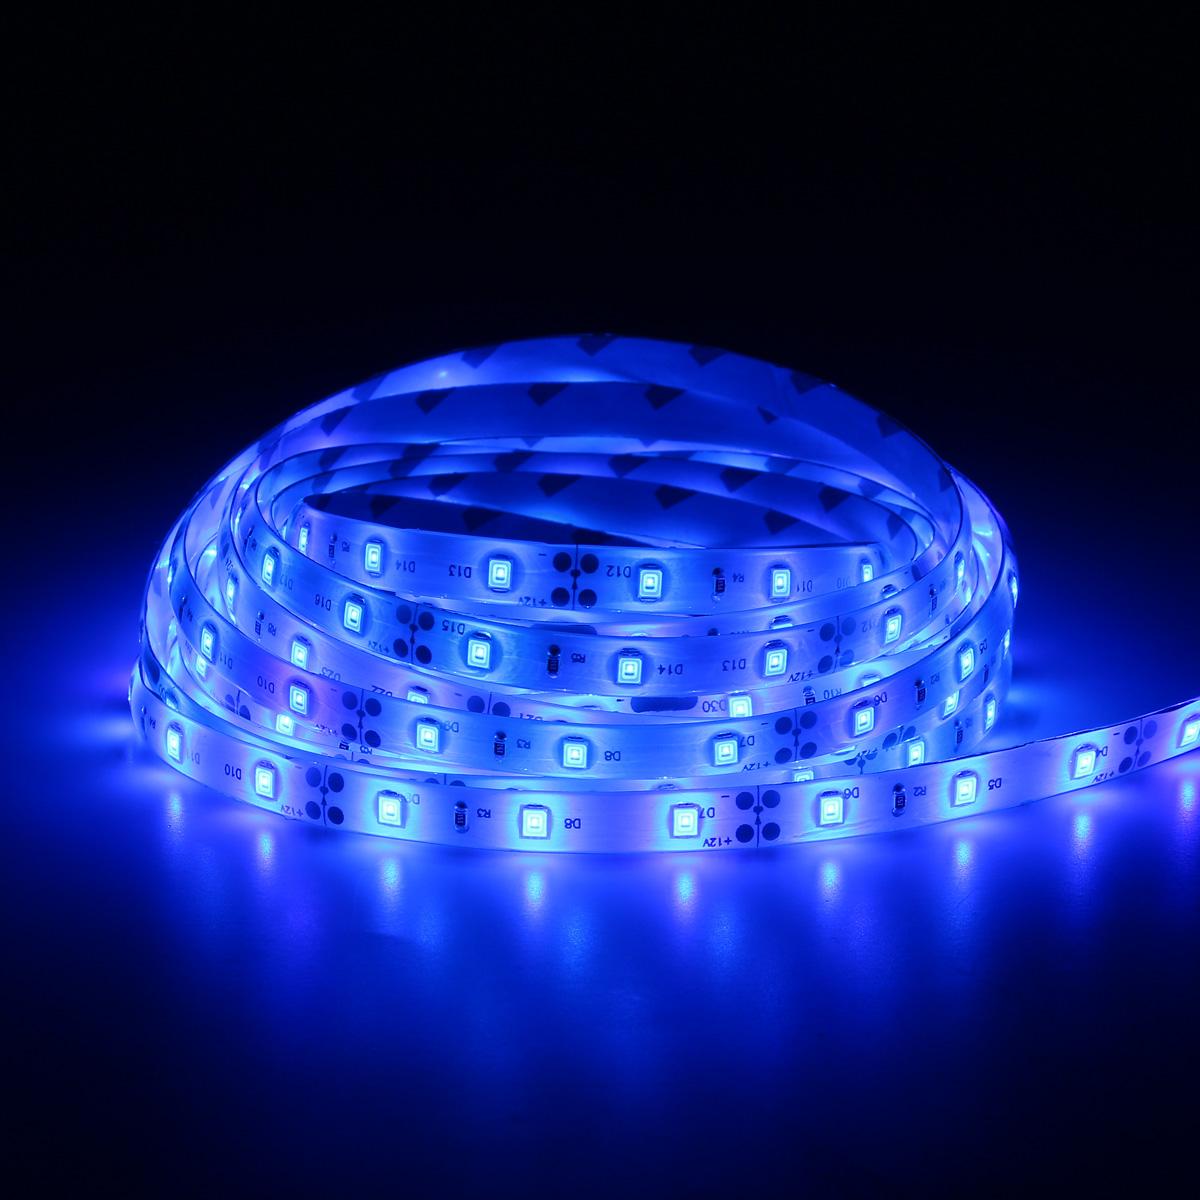 5M SMD3528 Flexible Blue 300 LED Strip Light Lamp Waterproof Home Car Decor DC12V